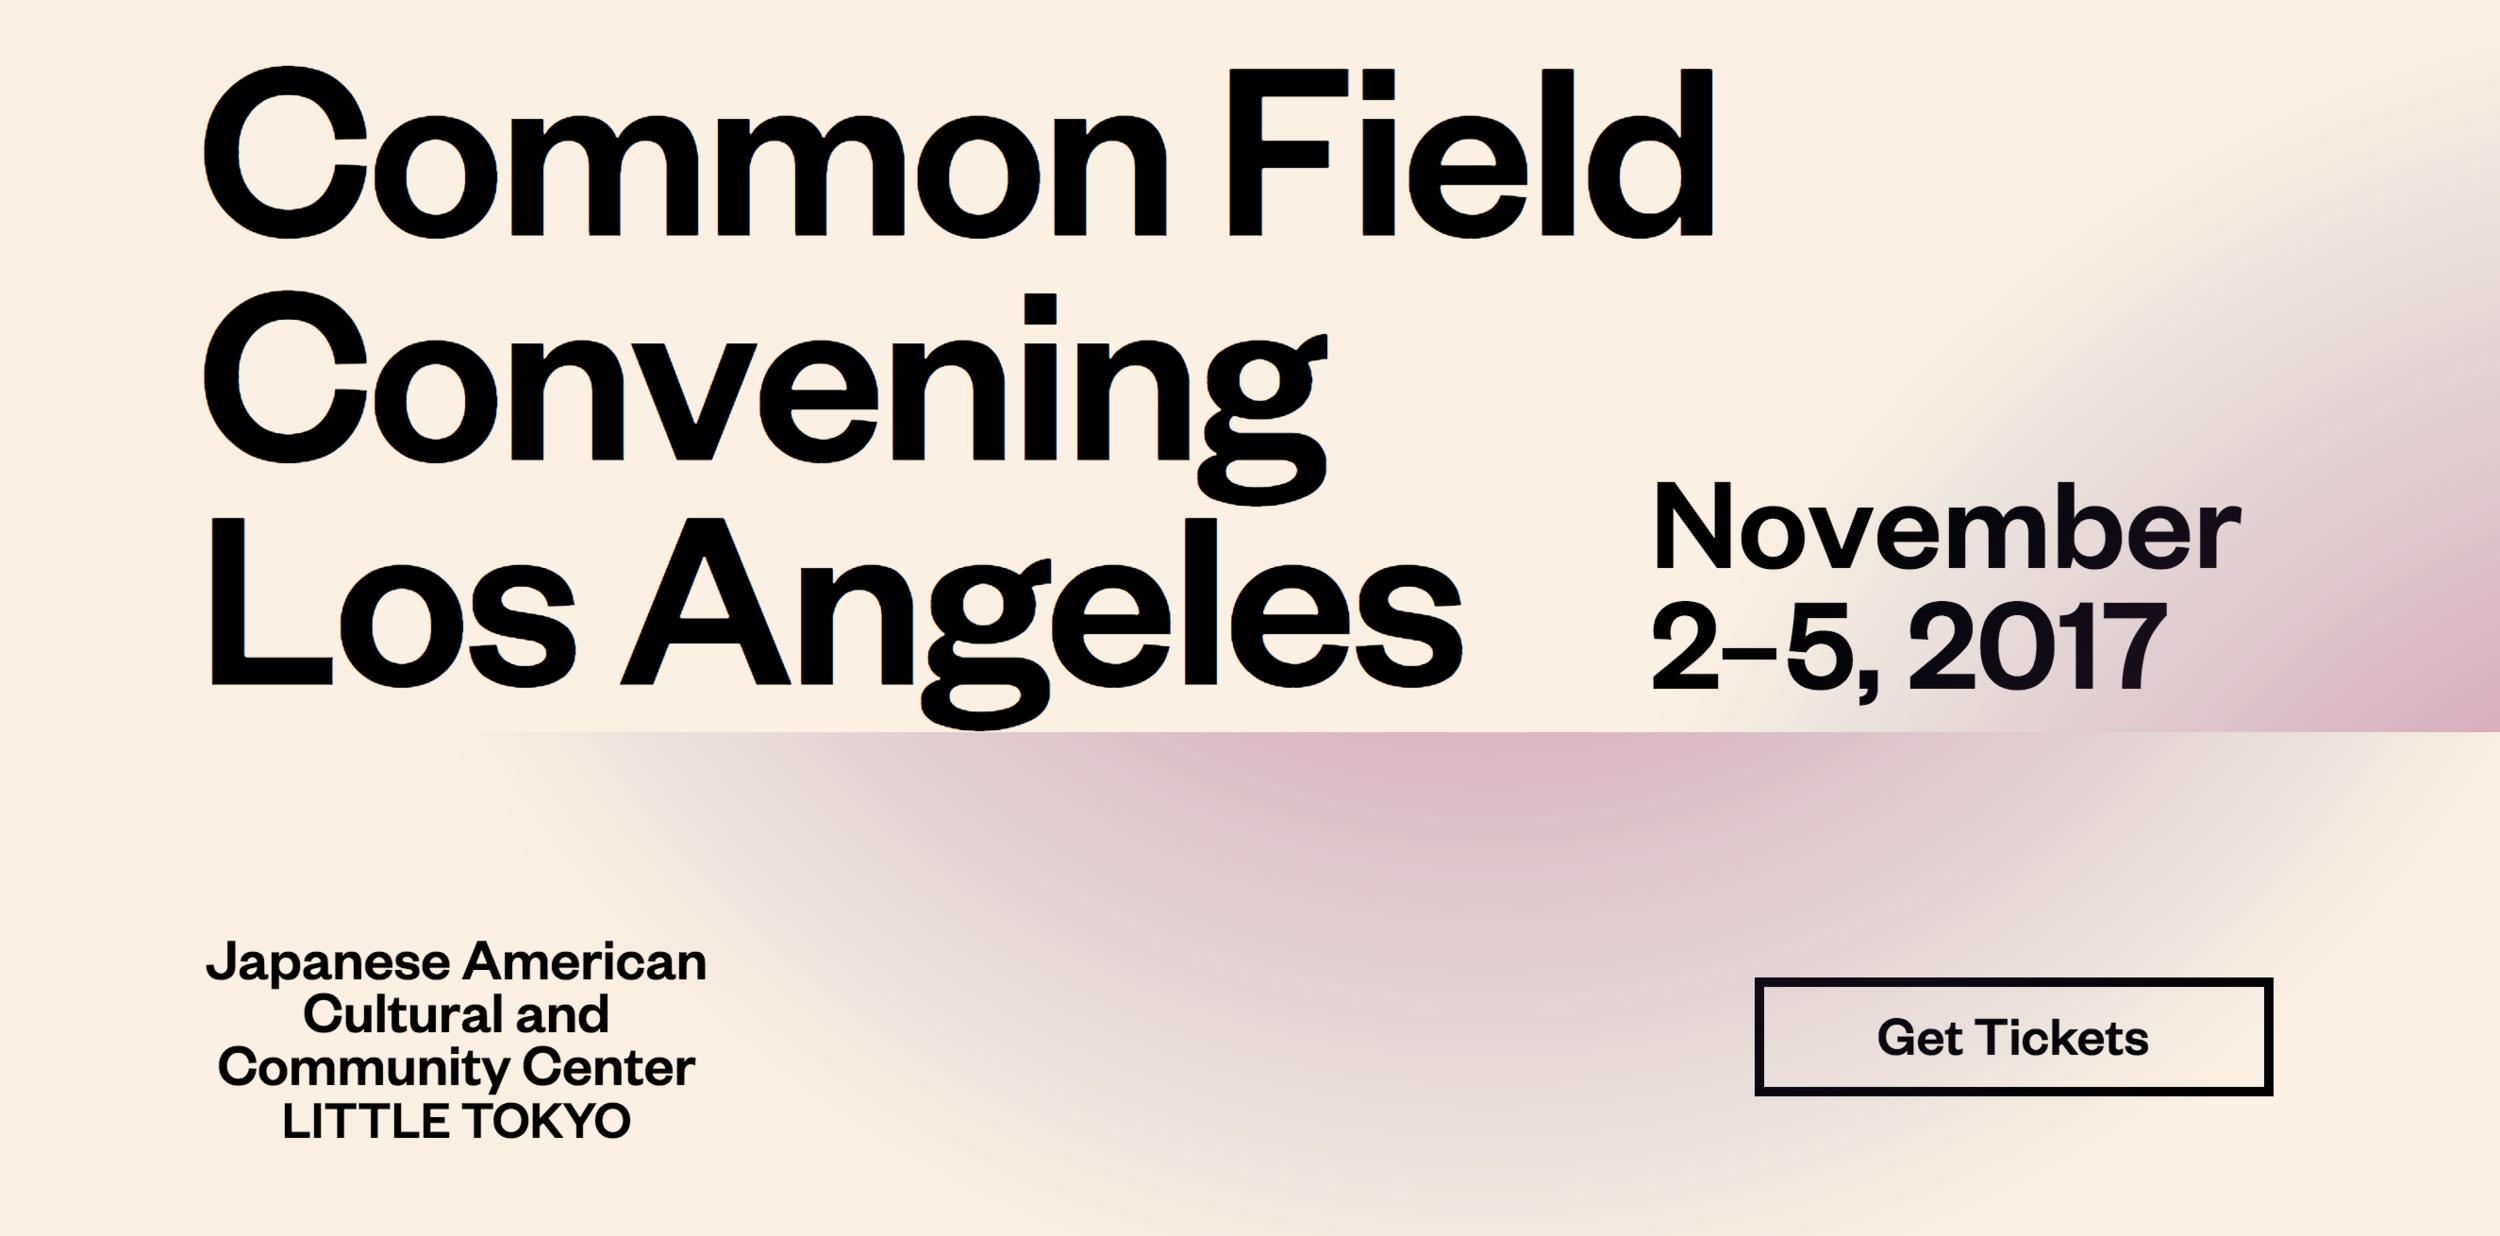 Common Field Convening